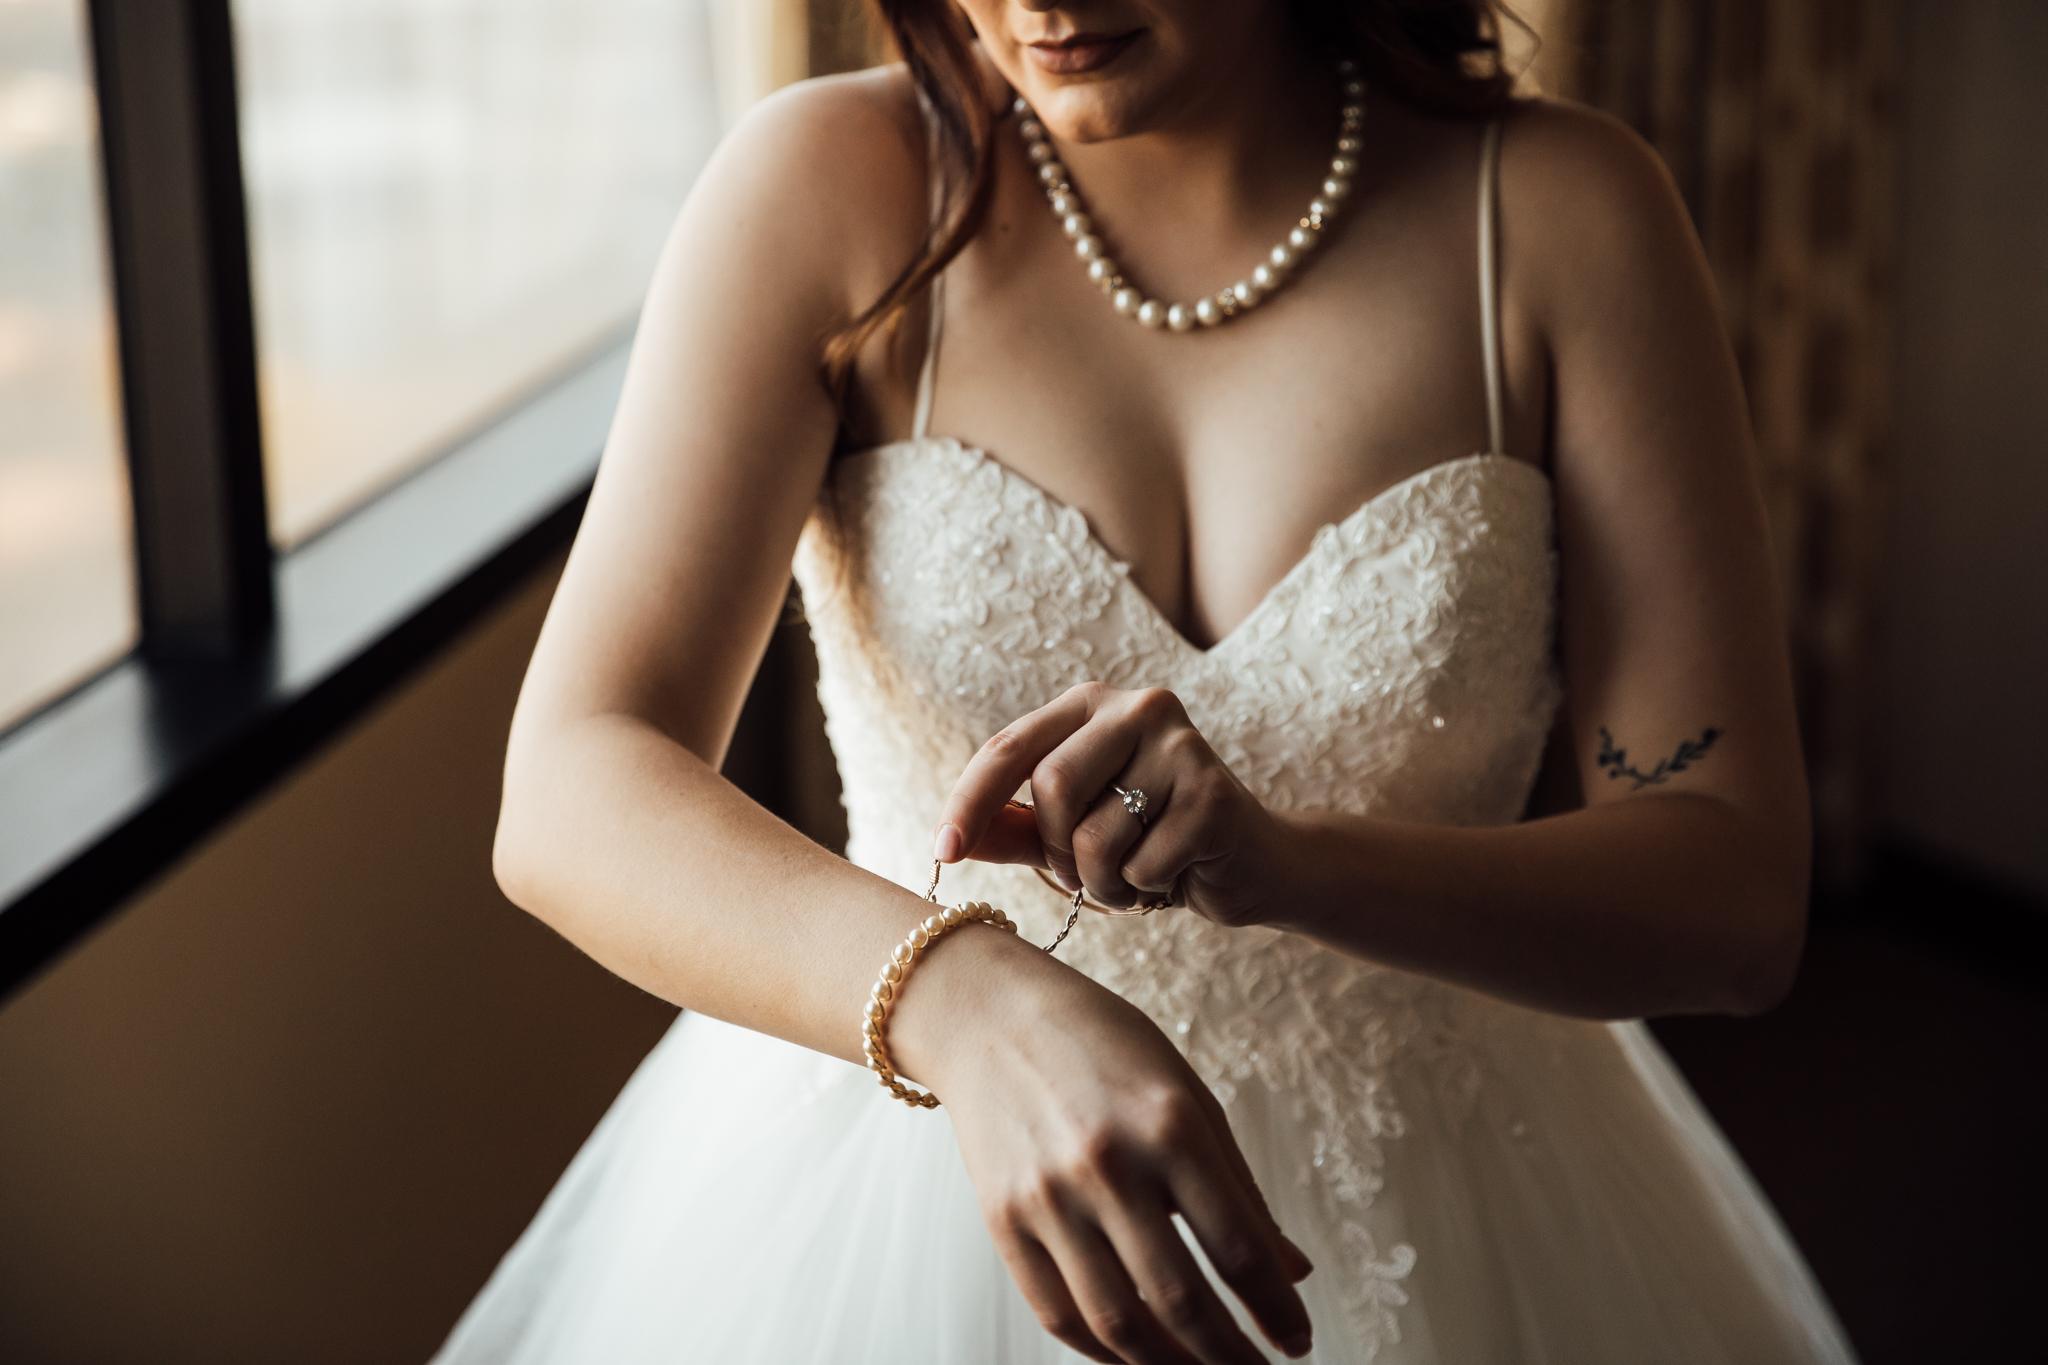 memphis-wedding-photographers-thewarmtharoundyou-ballinese-ballroom (48 of 232).jpg